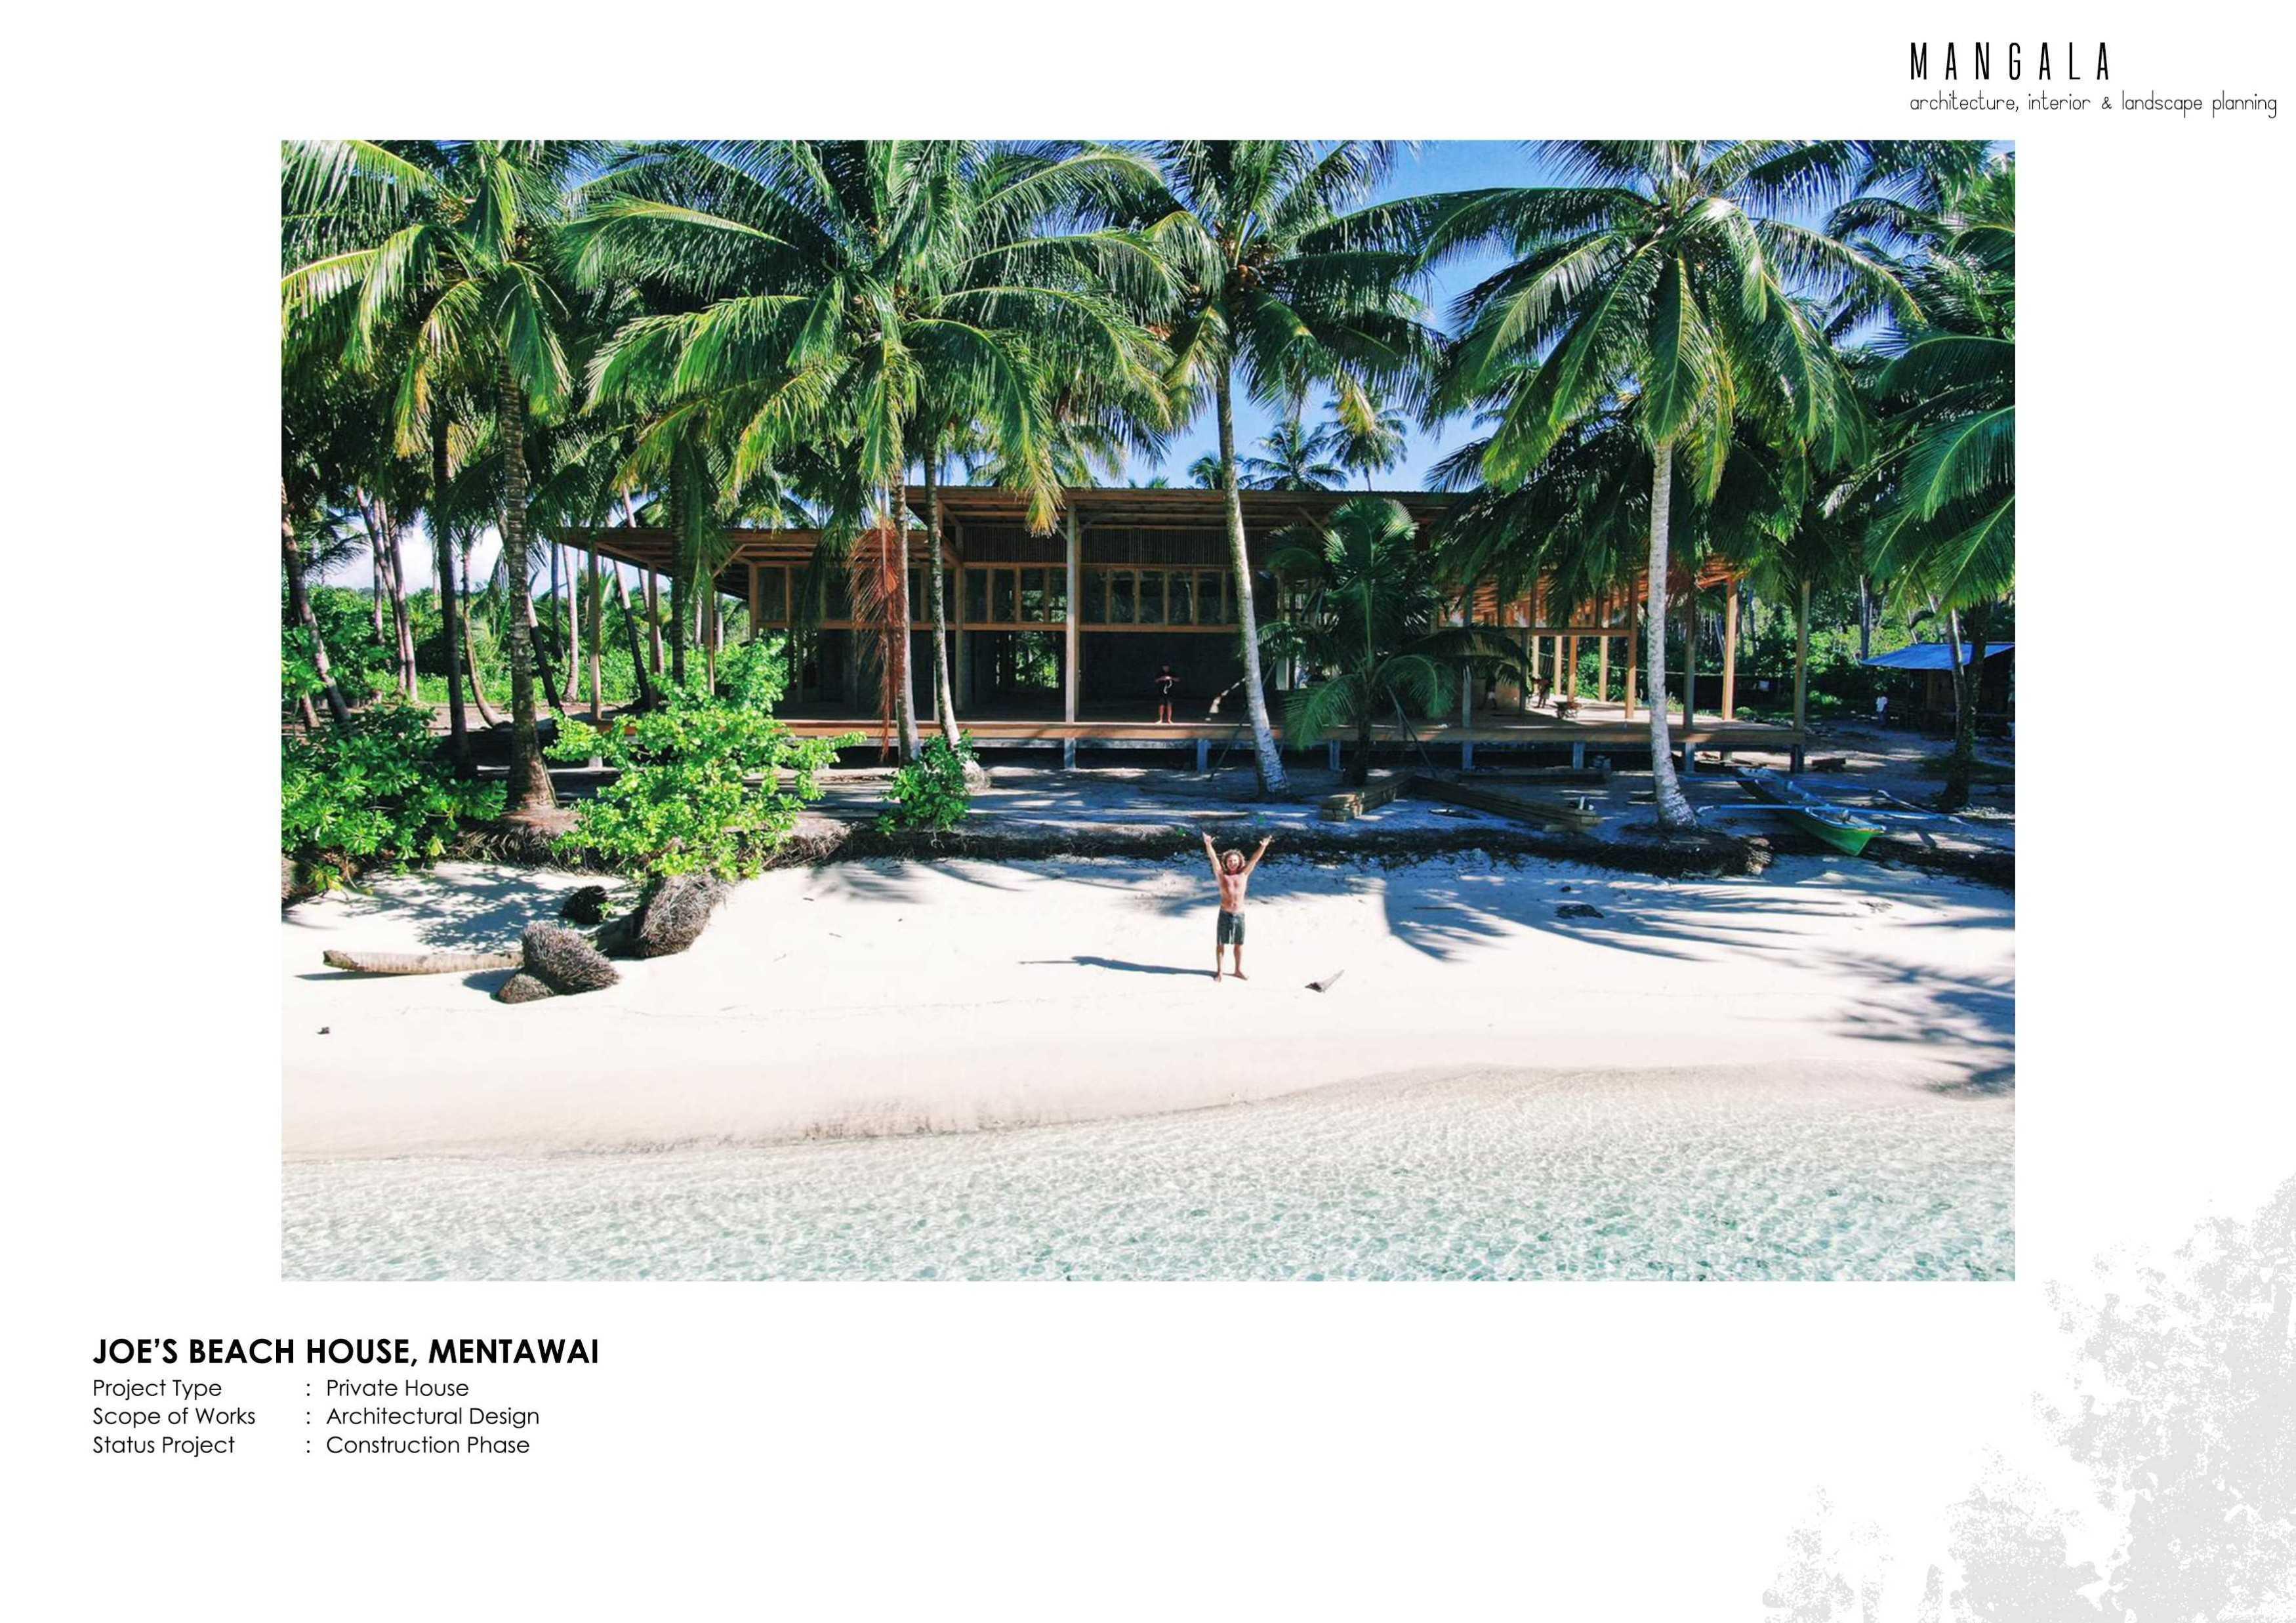 Revan Teggar Mentawai Beach House Kabupaten Kepulauan Mentawai, Sumatera Barat, Indonesia Kabupaten Kepulauan Mentawai, Sumatera Barat, Indonesia Revan-Teggar-Mentawai-Beach-House   107030